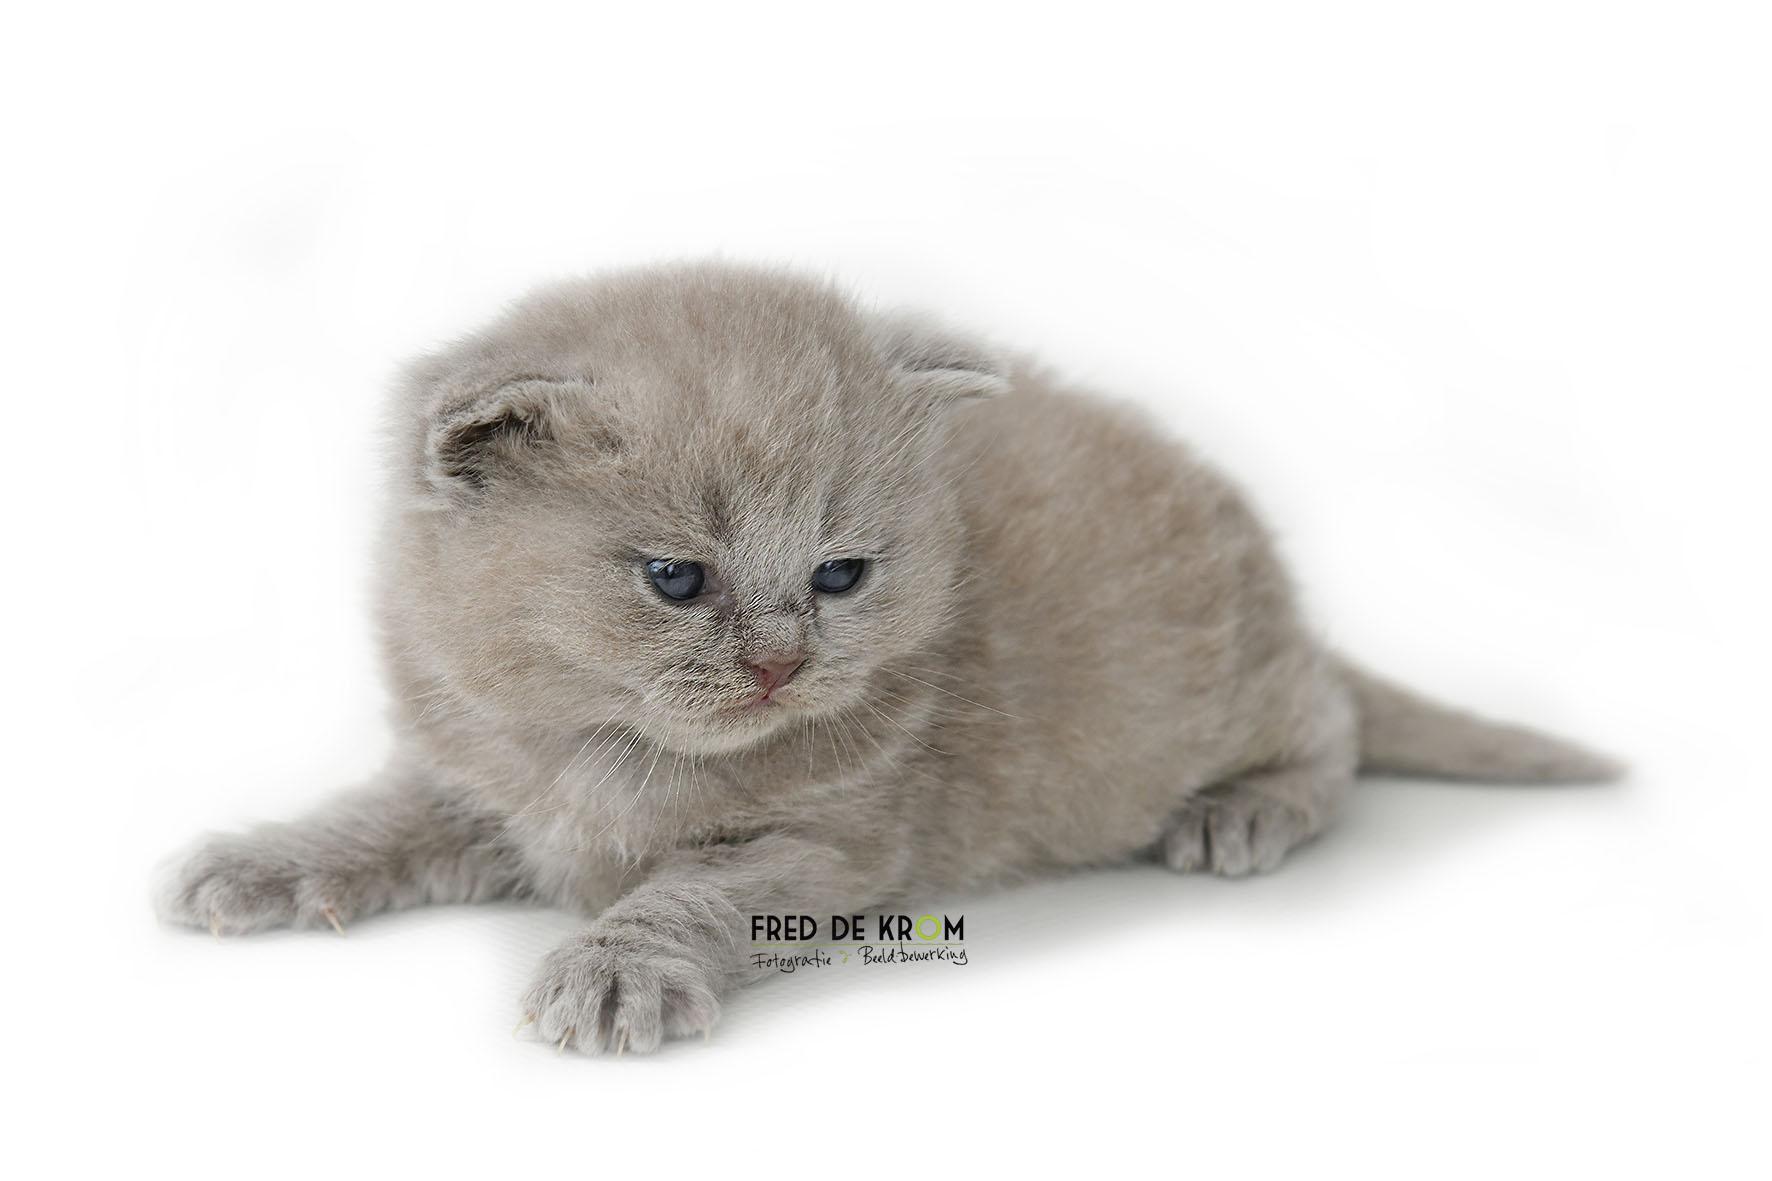 Britse korthaar kitten, liggend, witte achtergrond.